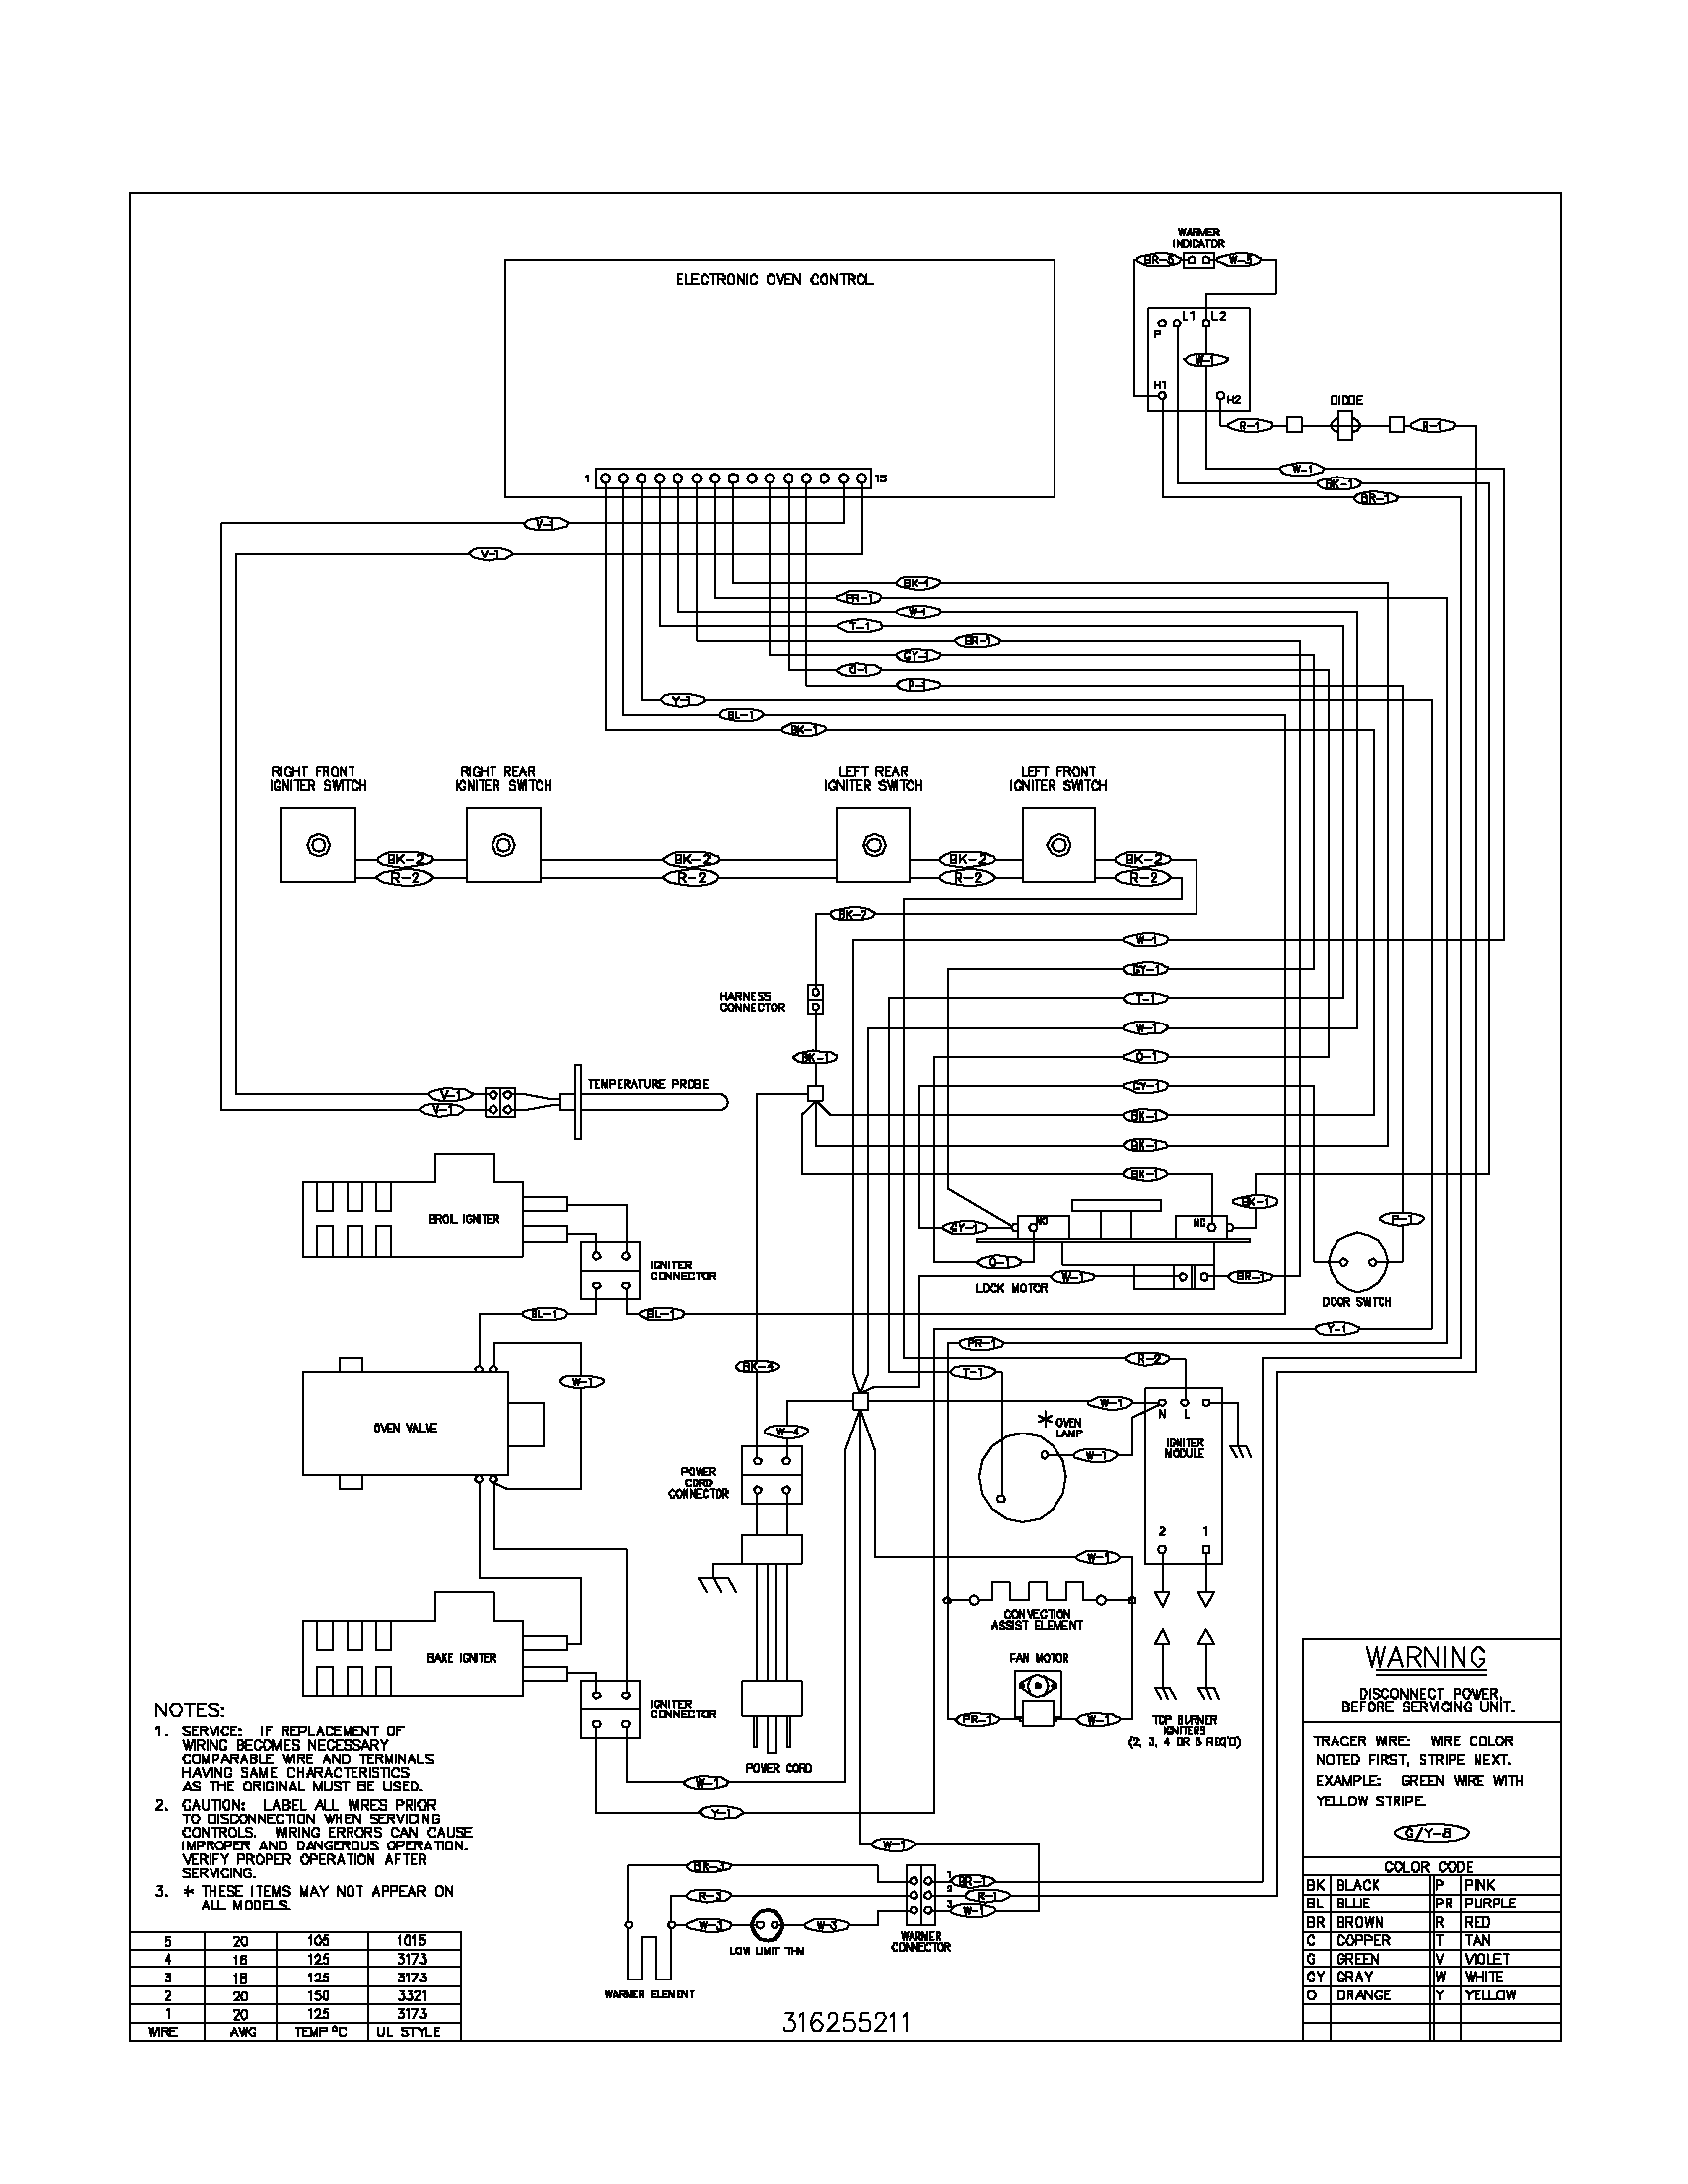 wiring diagram parts?resize=665%2C861 diagrams 750500 white knight tumble dryer wiring diagram tumble white knight tumble dryer wiring diagram at pacquiaovsvargaslive.co